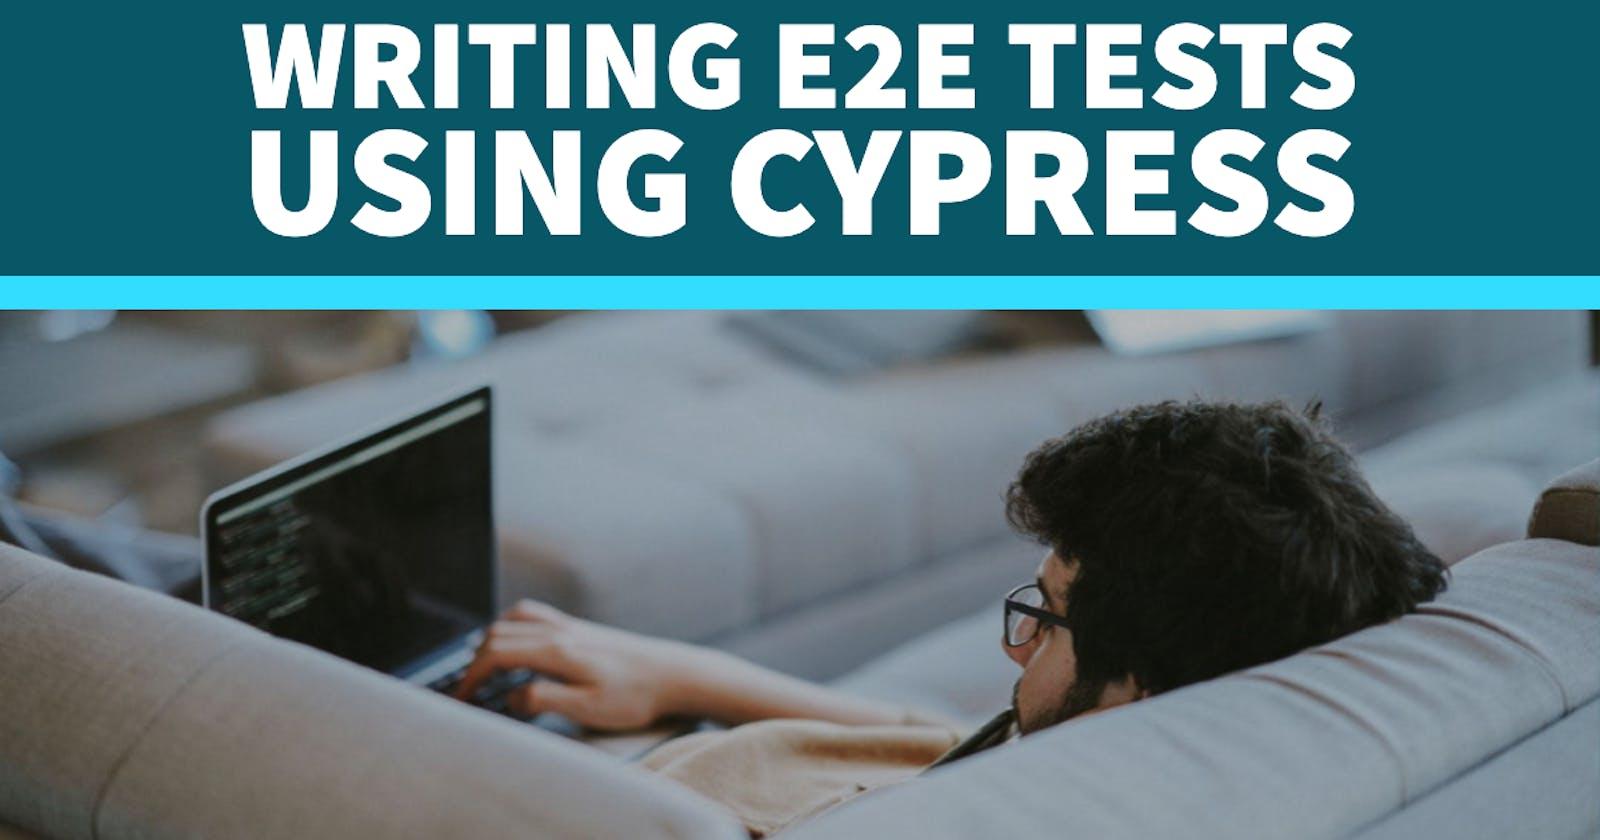 Writing e2e tests using Cypress